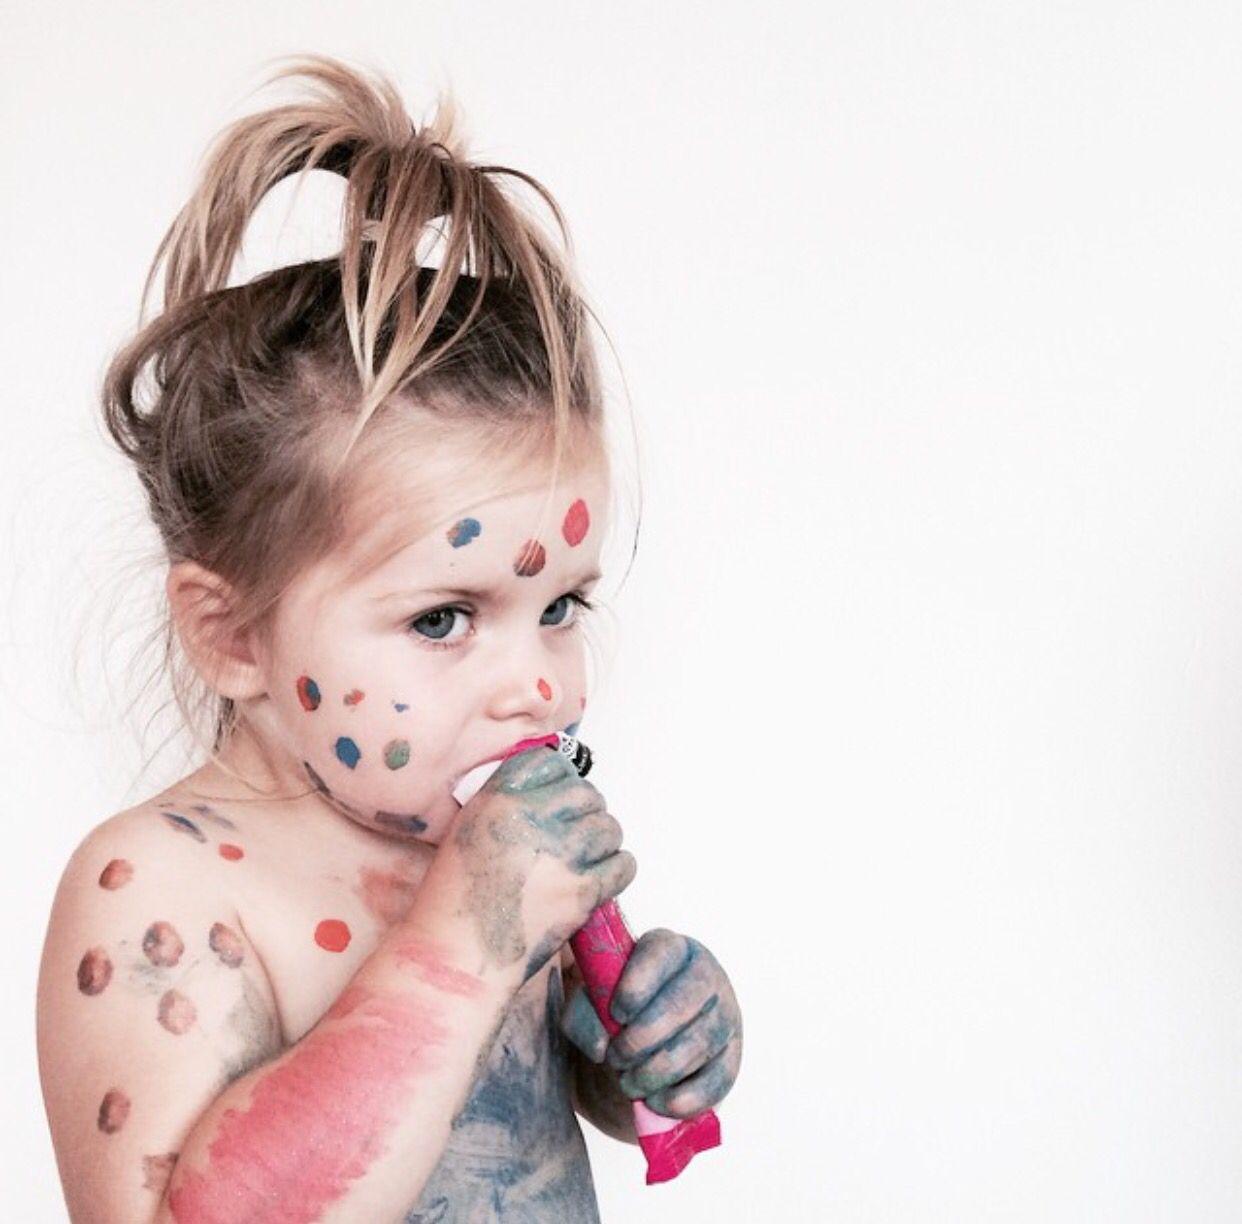 yogurt pops & paint!